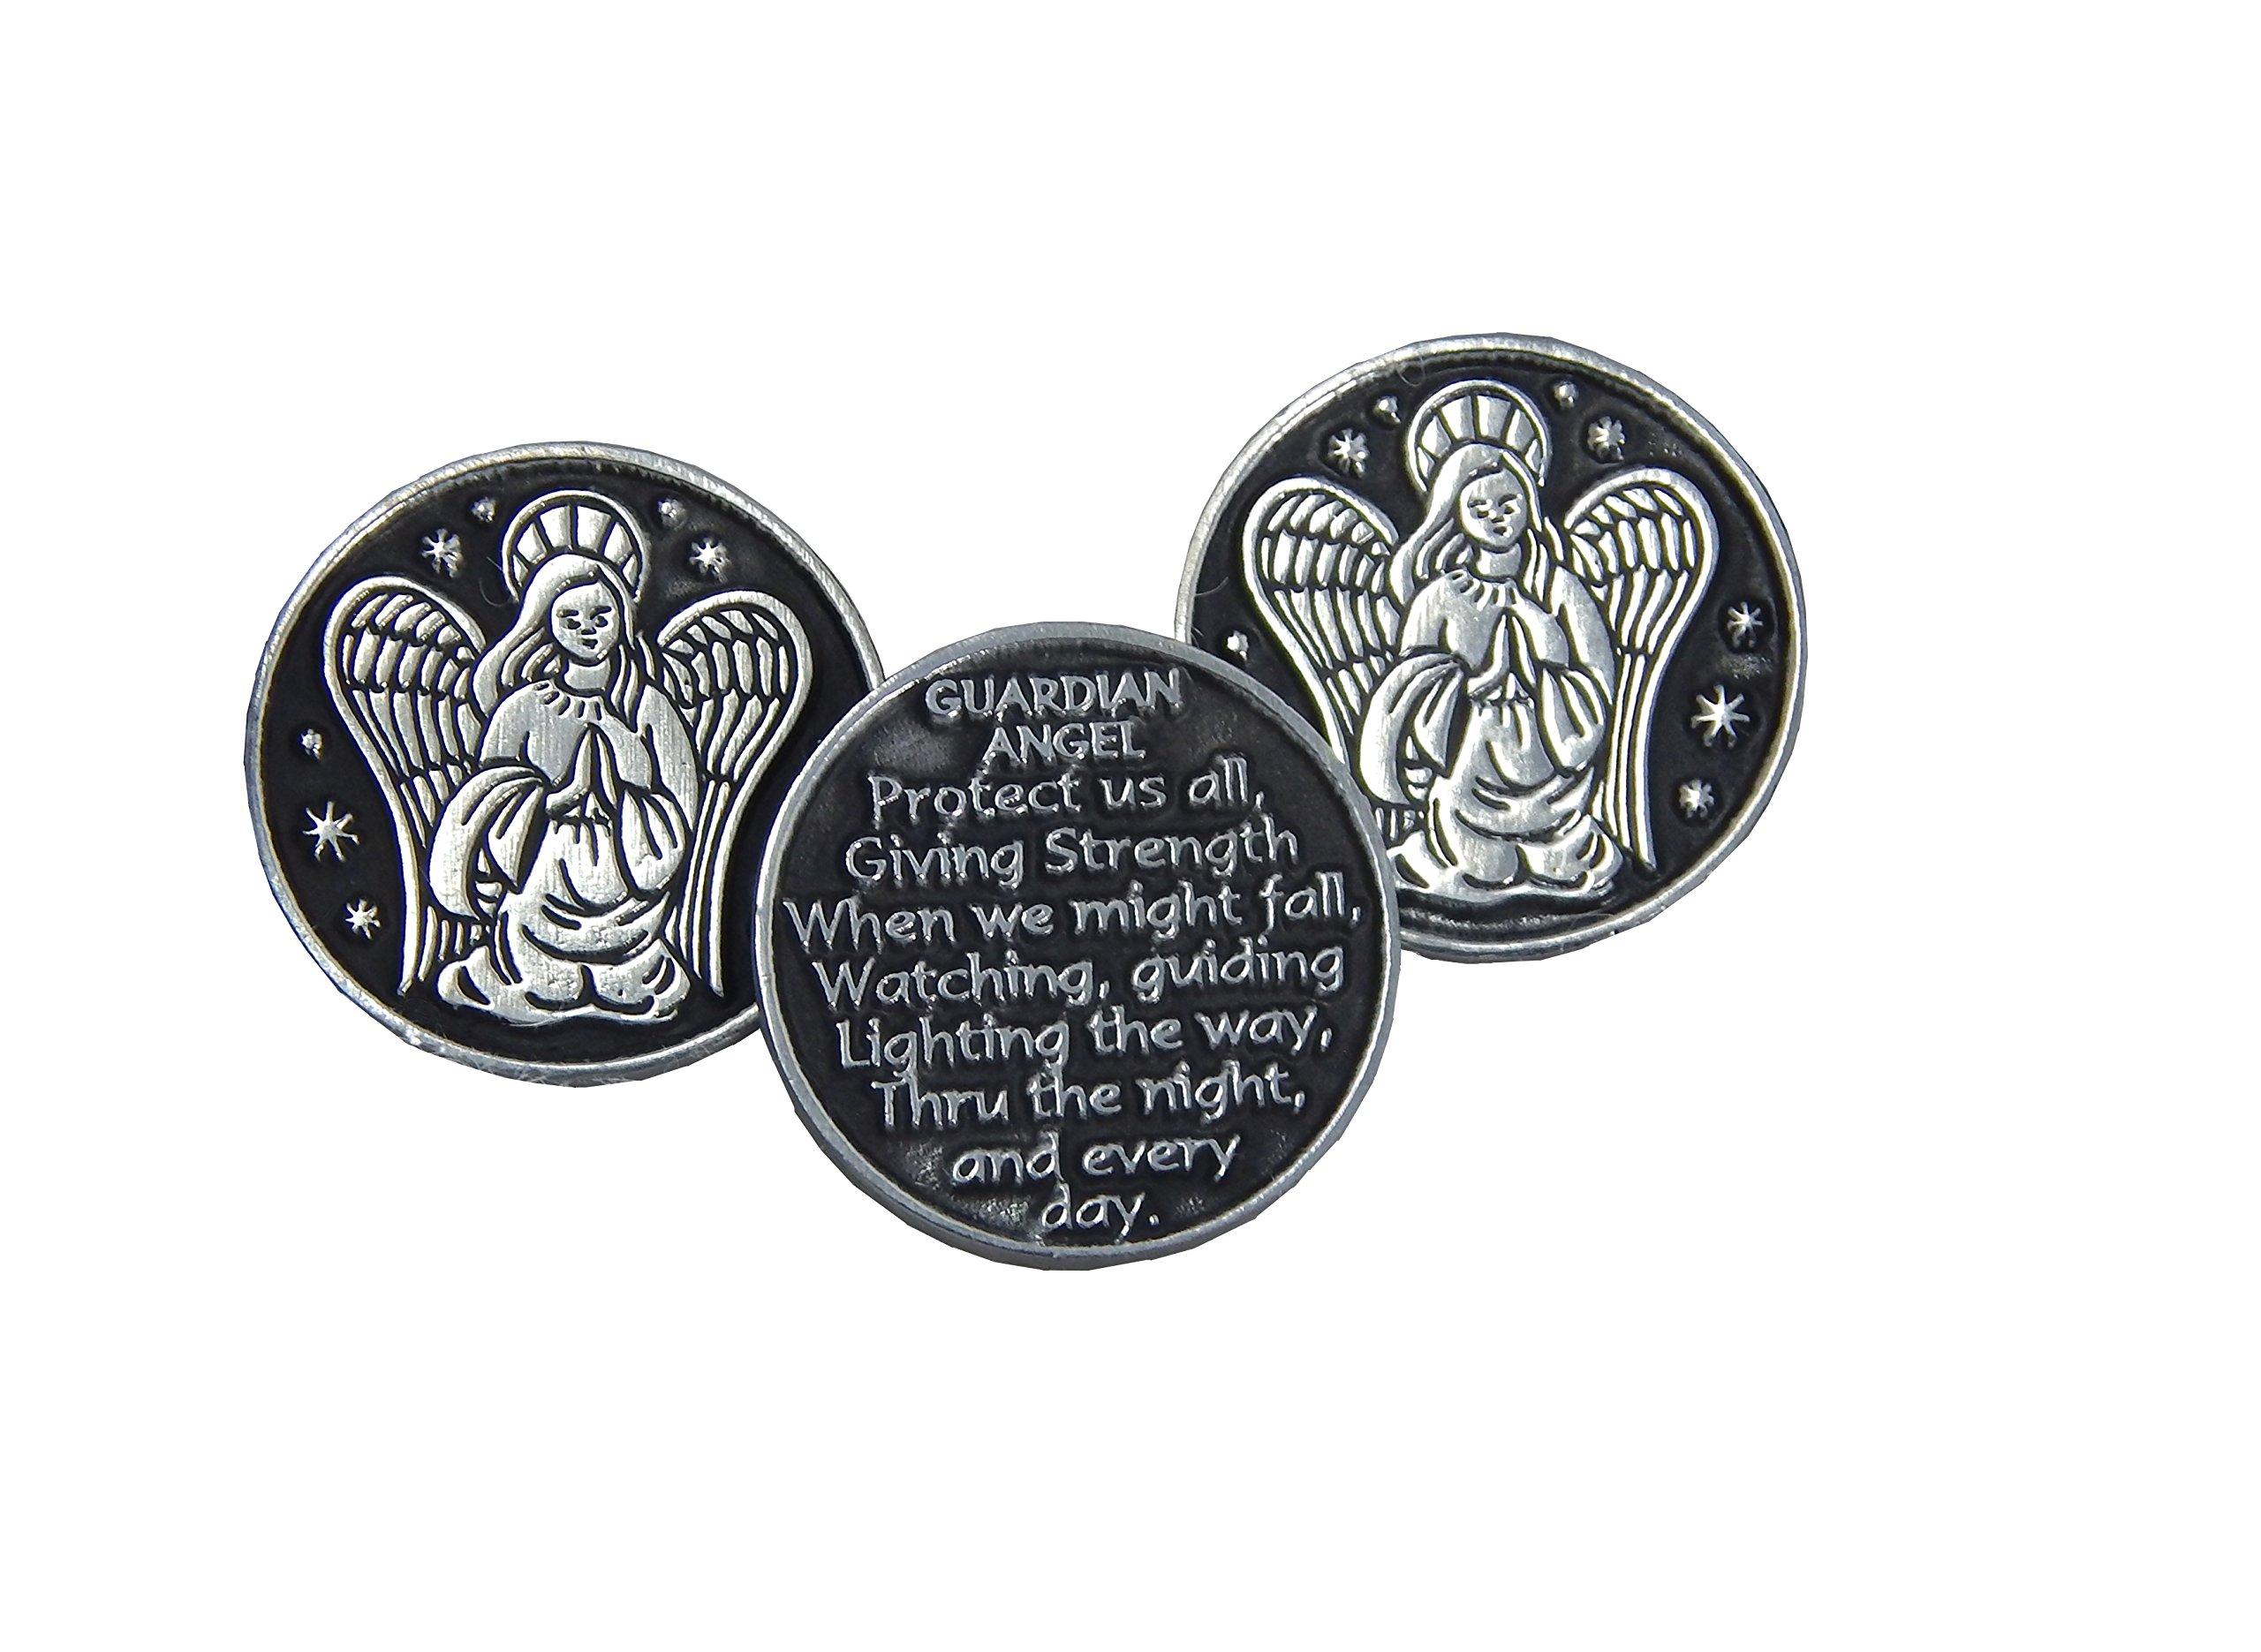 Guardian Angel Prayer Pocket Token - 3 Coins